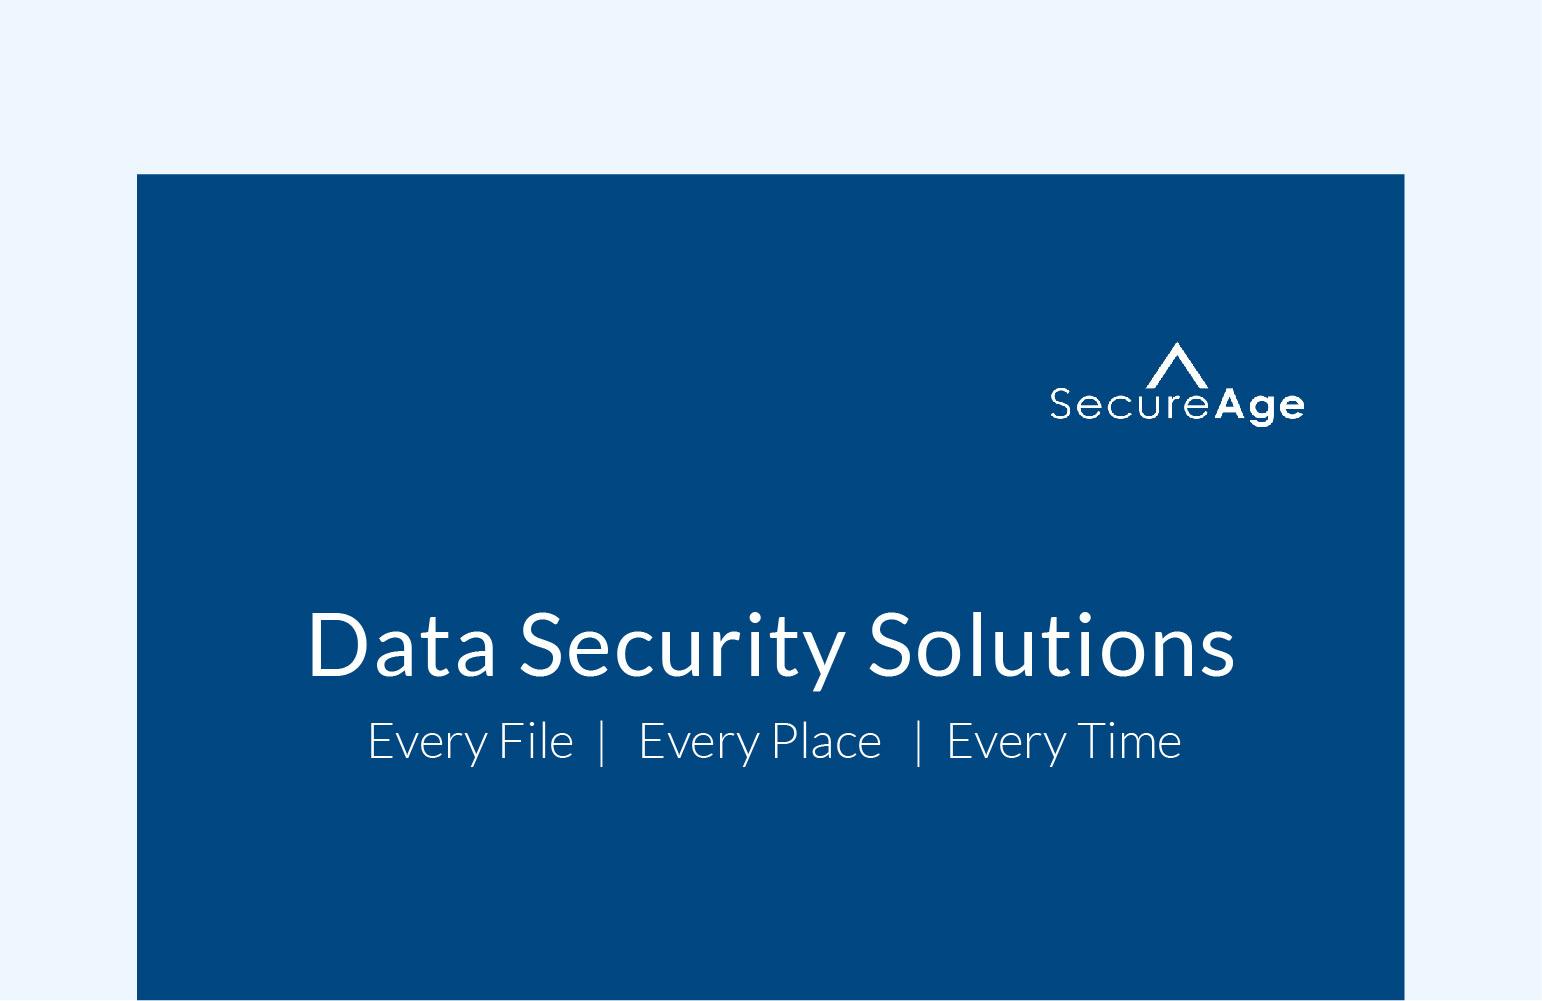 SecureAge Product Catalogue